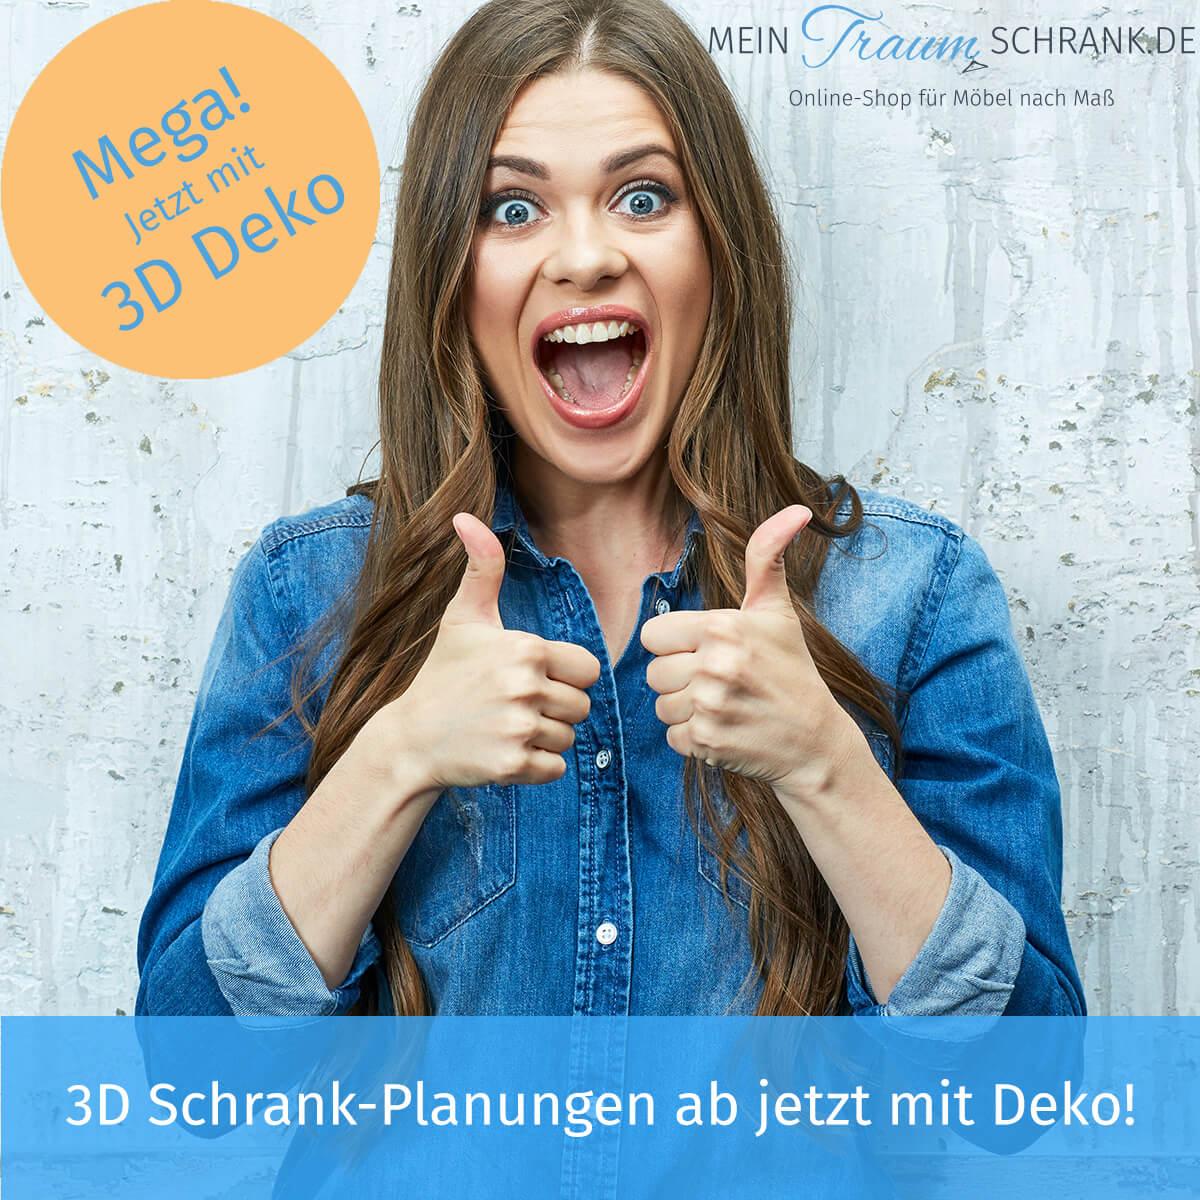 Schrank-Konfigurator in 3D mit Deko